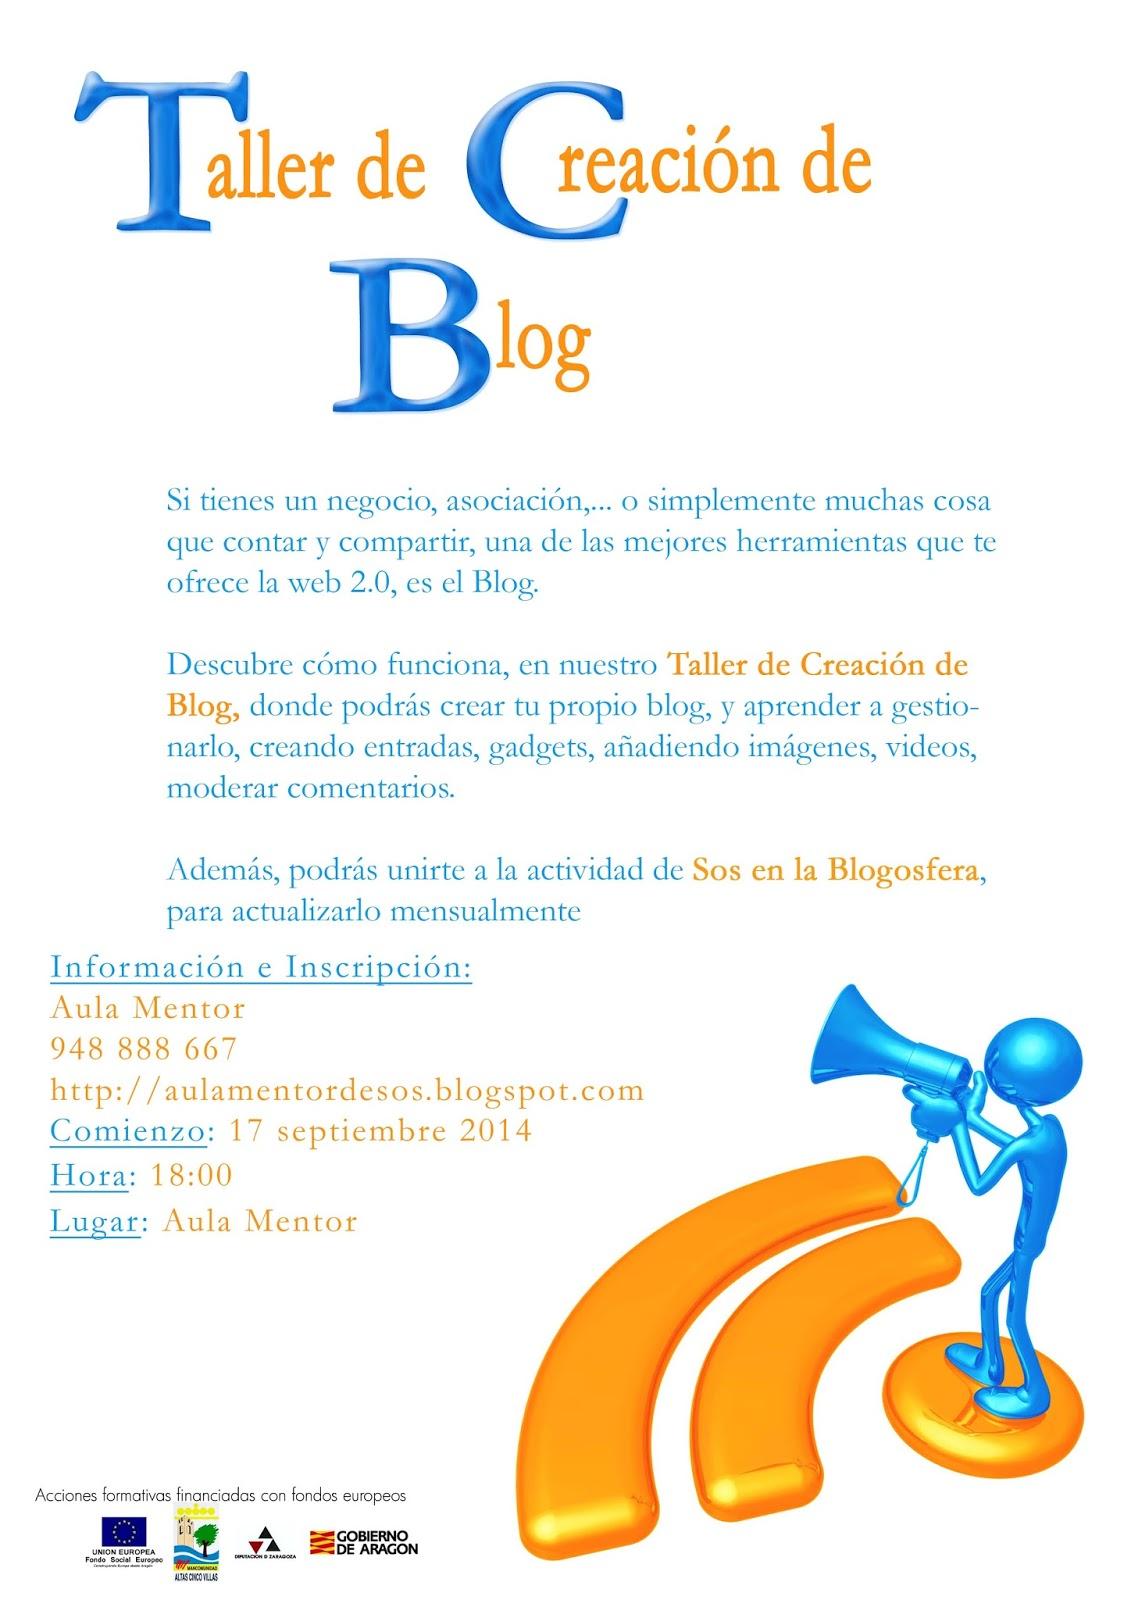 Taller de Blog - Sos del Rey Católico